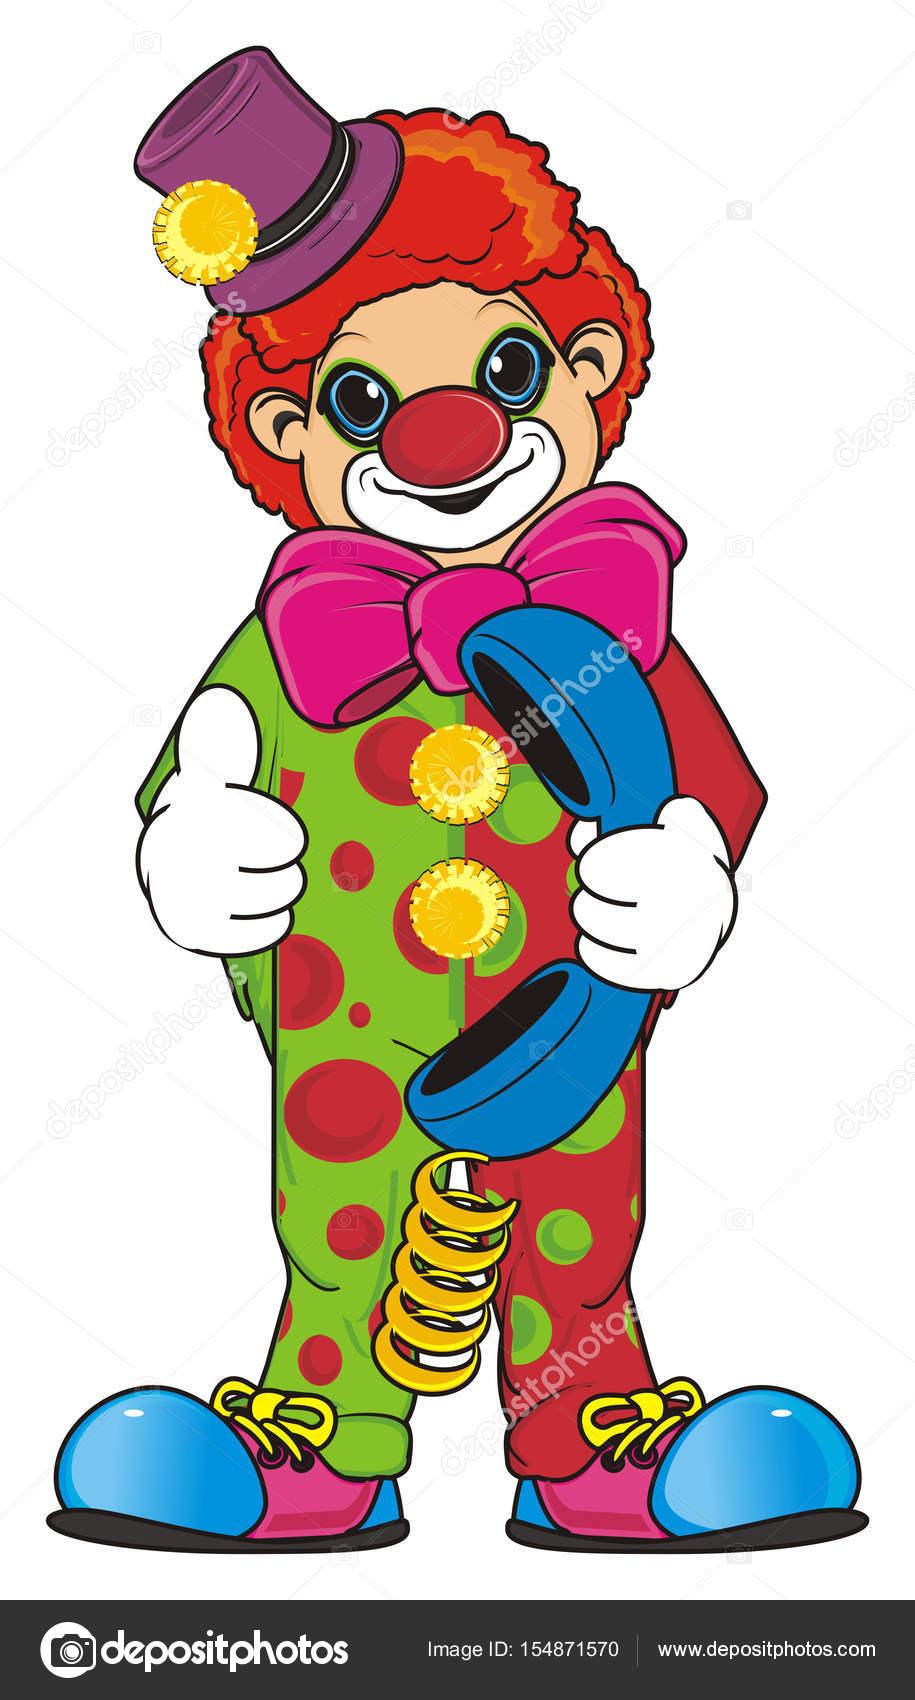 Smiling Colored Clown Stock Photo C Tatty77tatty 154871570